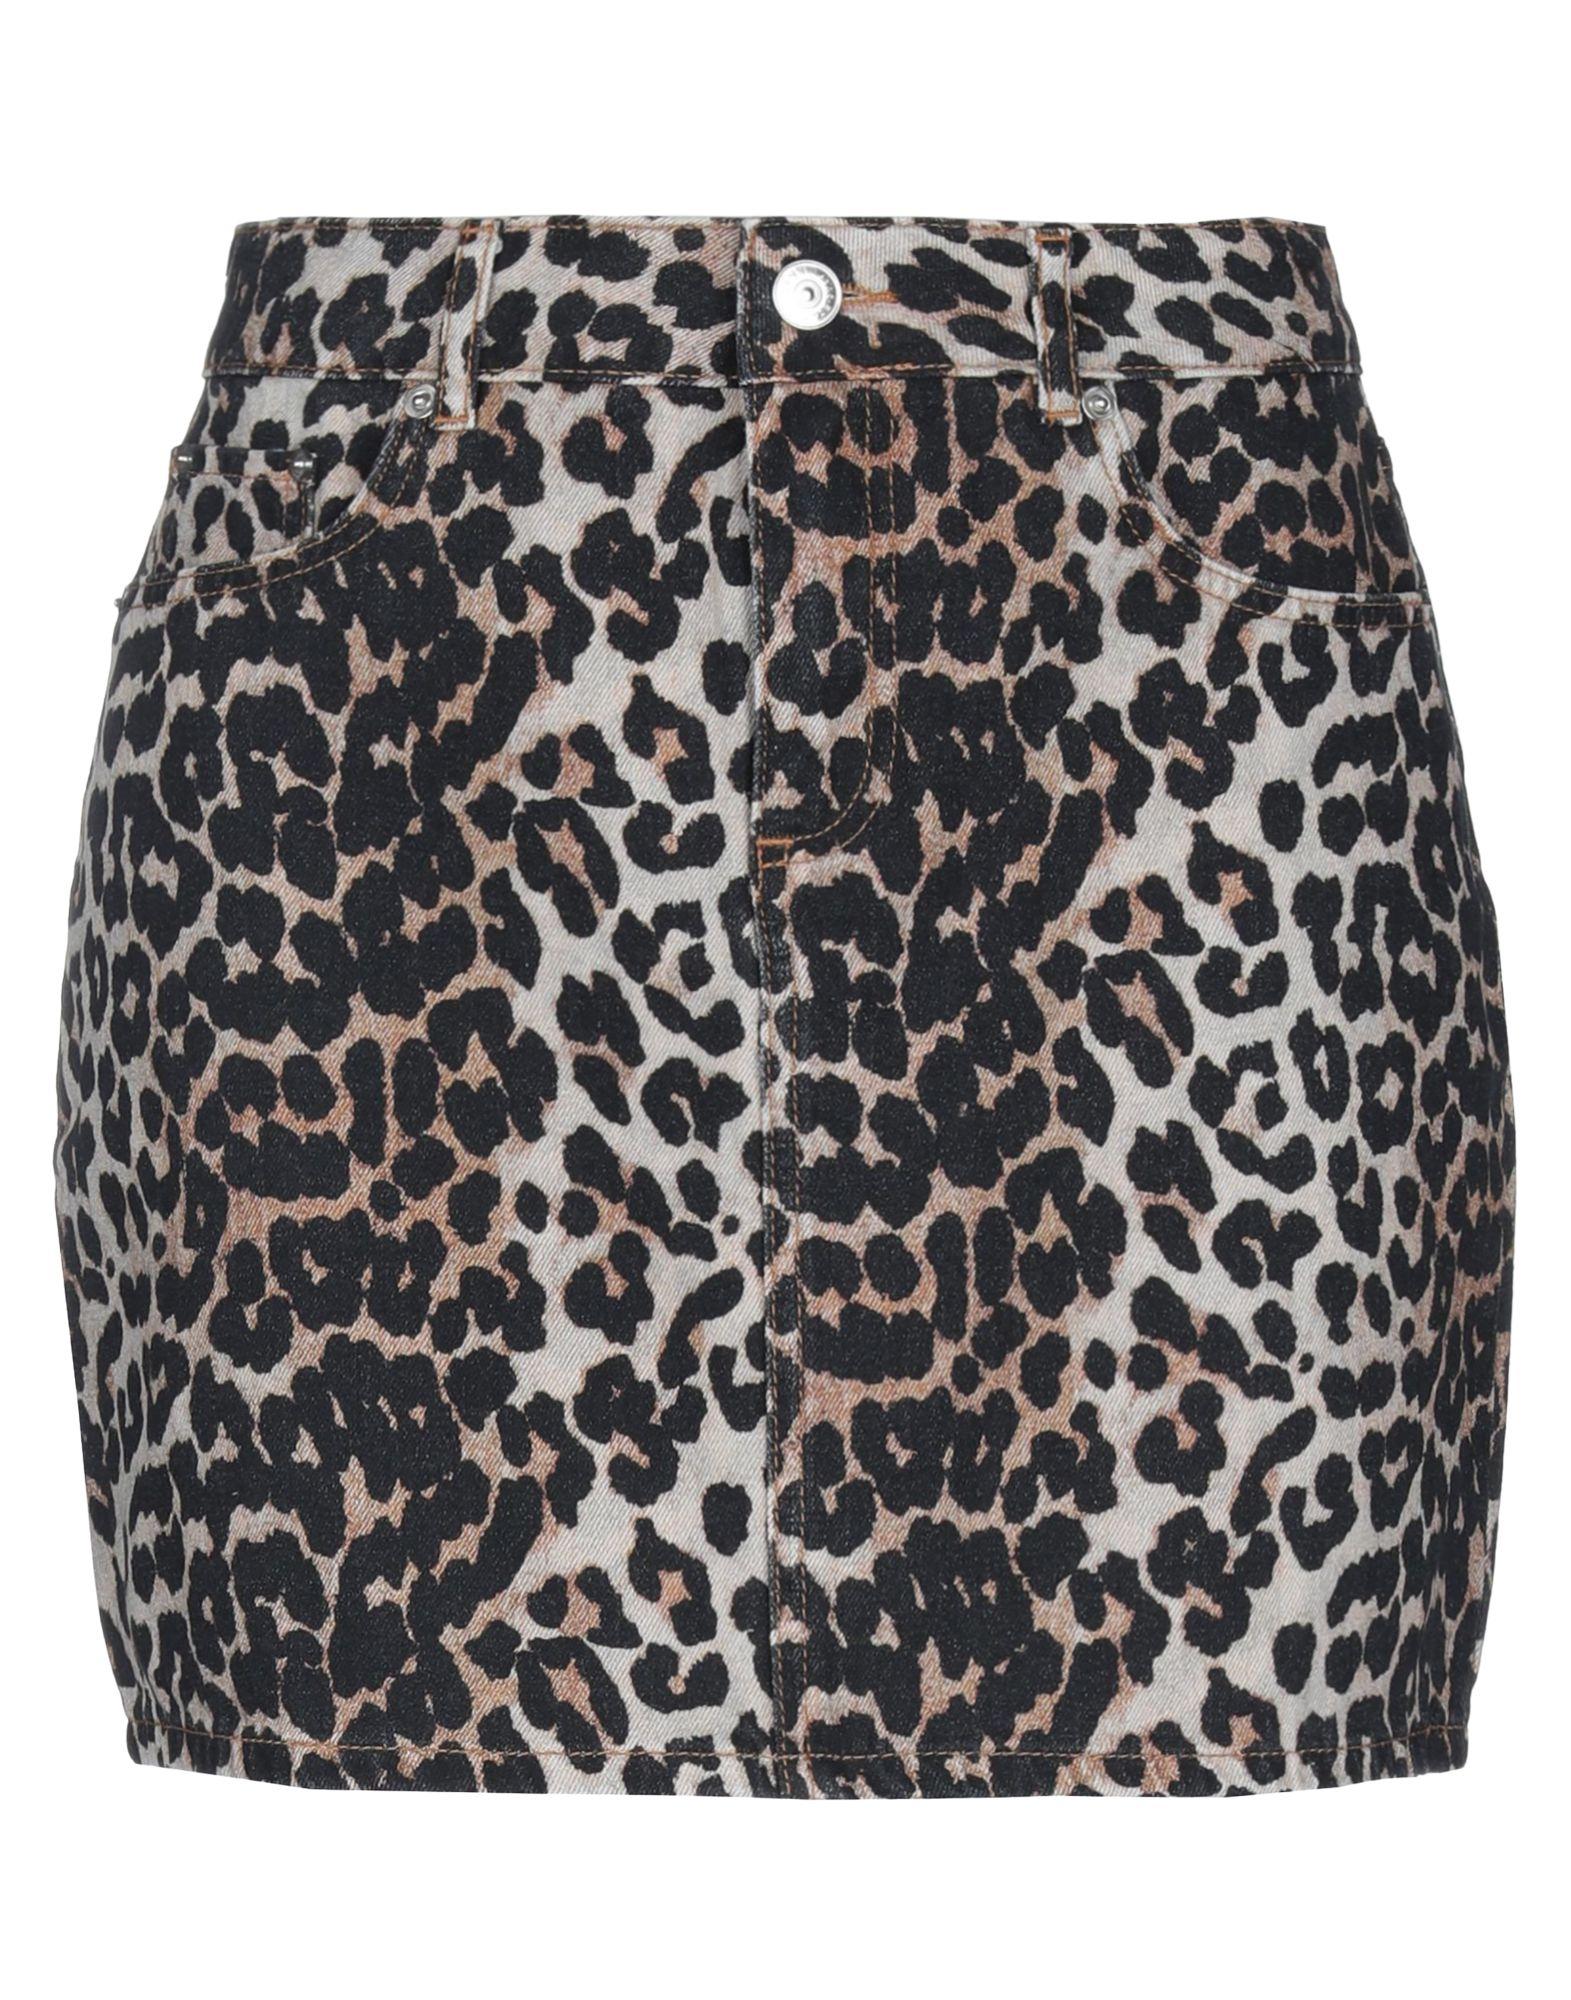 GANNI Denim skirts. denim, logo, leopard-print, colored wash, front closure, button, zip, multipockets, unlined. 100% Cotton